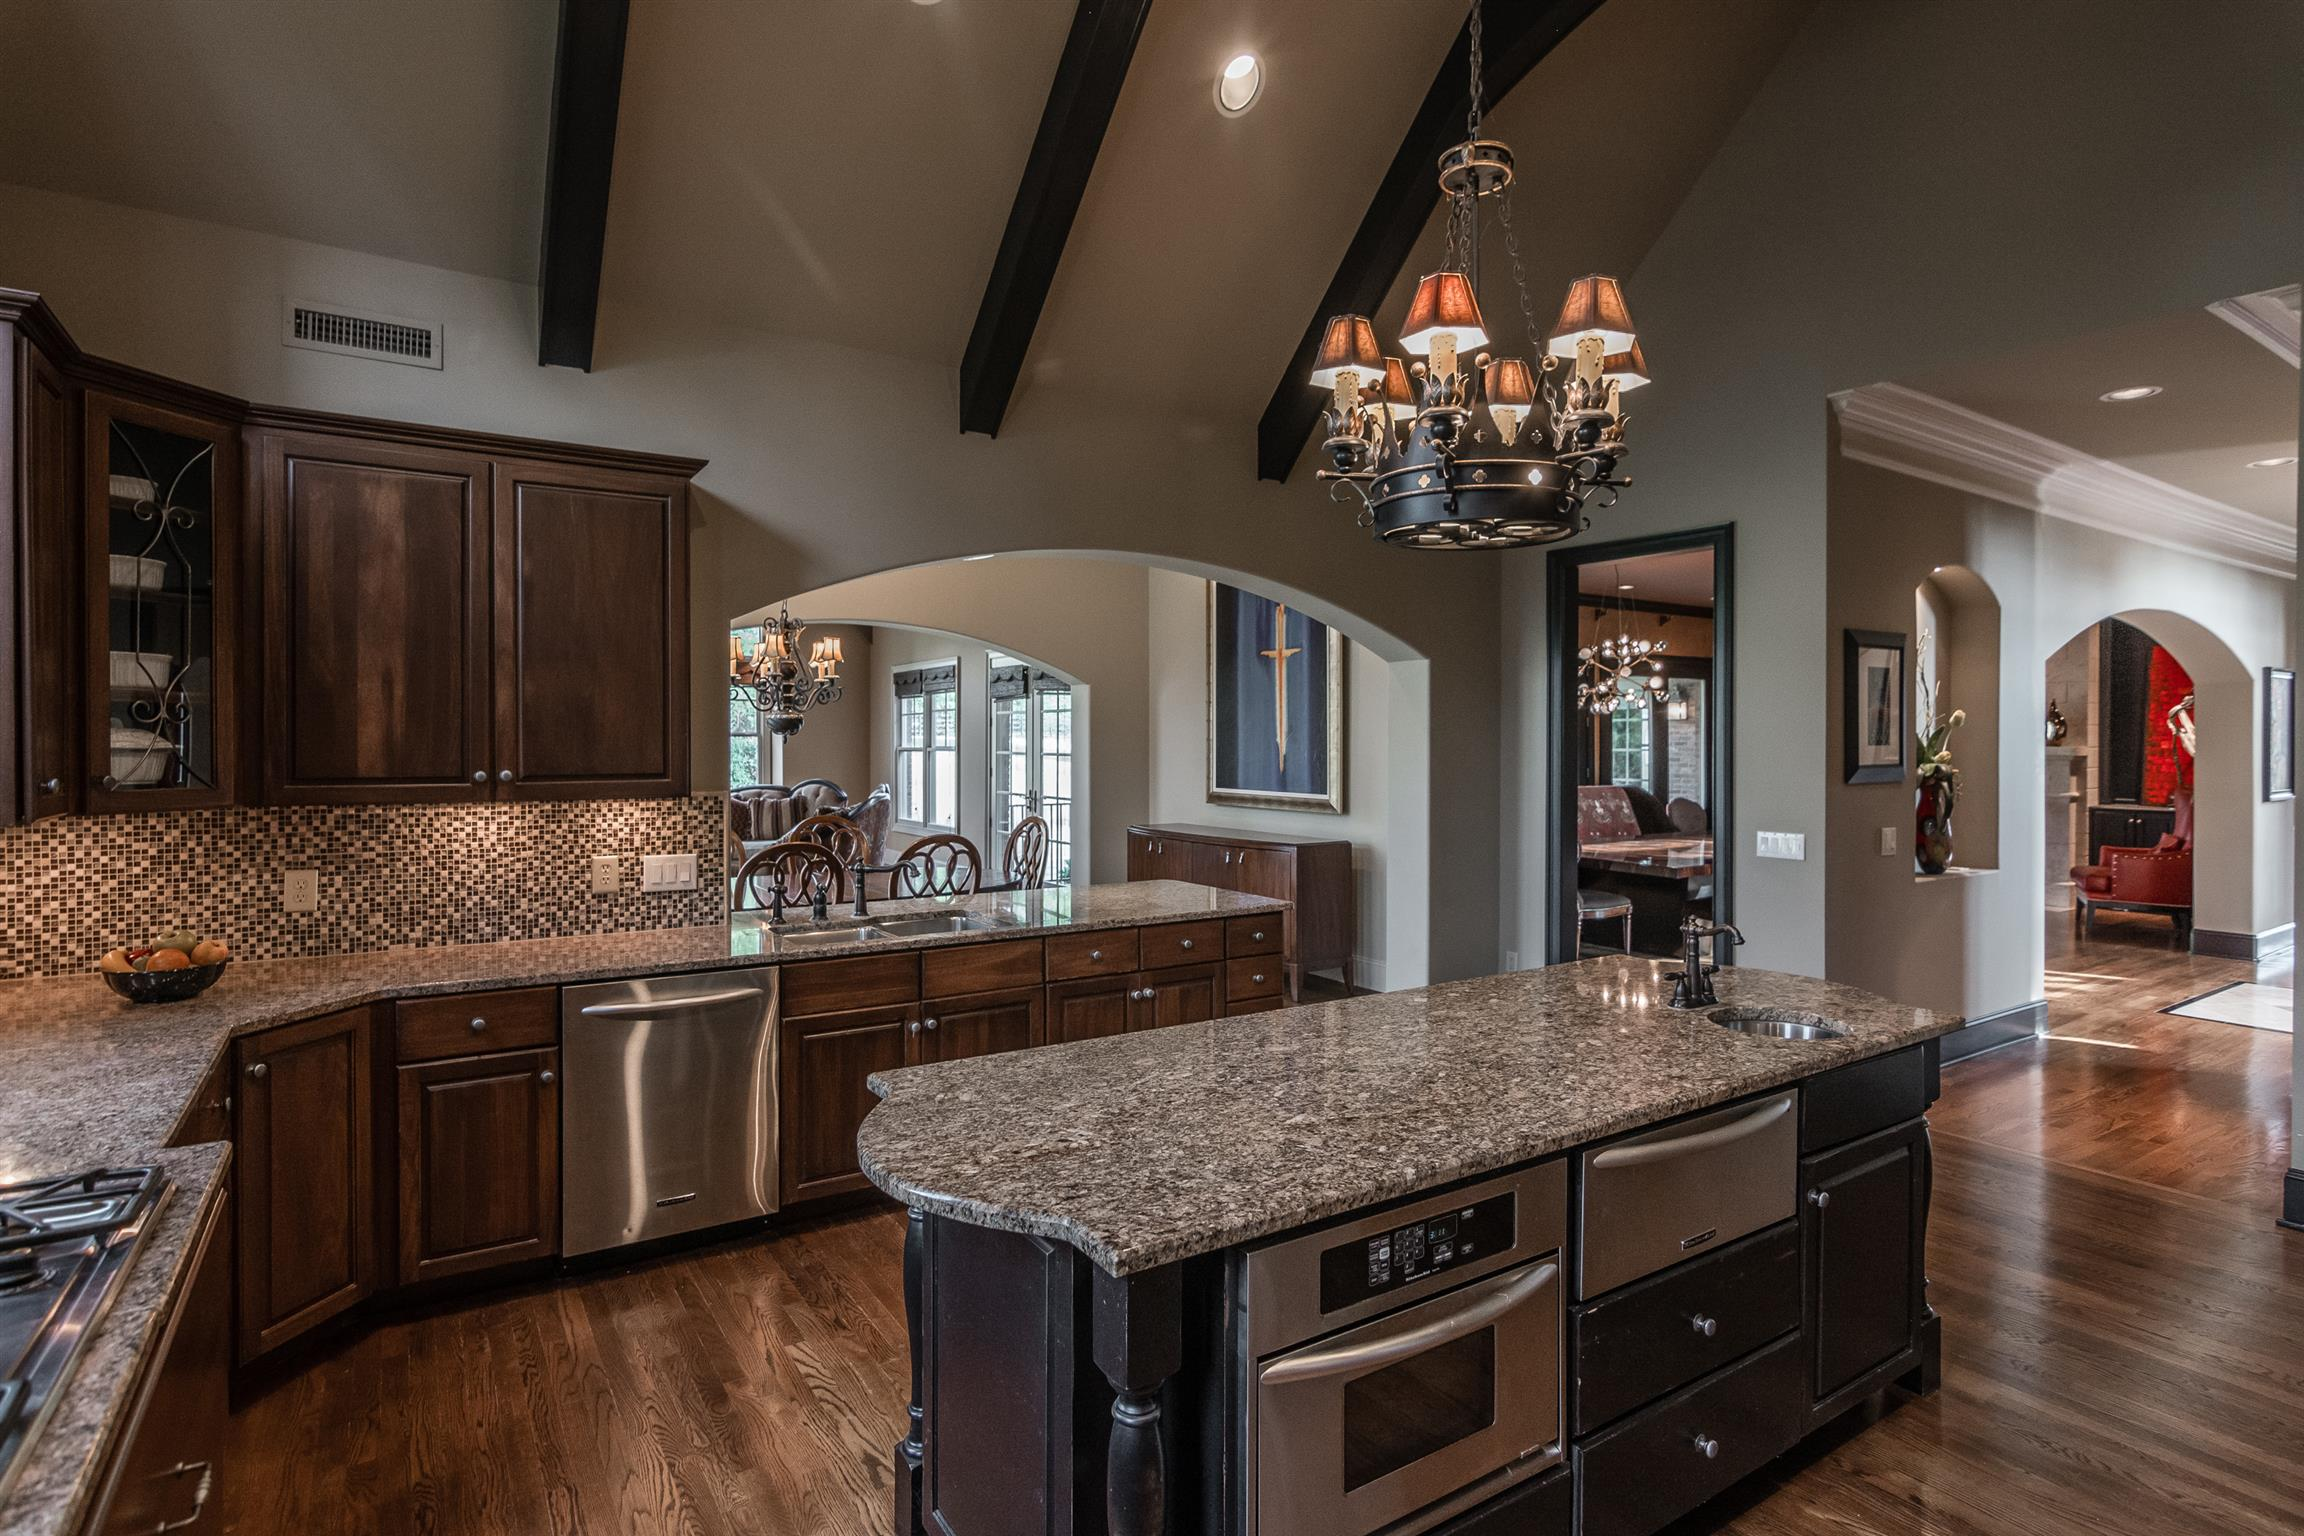 $950,000 - 5Br/6Ba -  for Sale in Bluegrass Downs Sec 4, Hendersonville